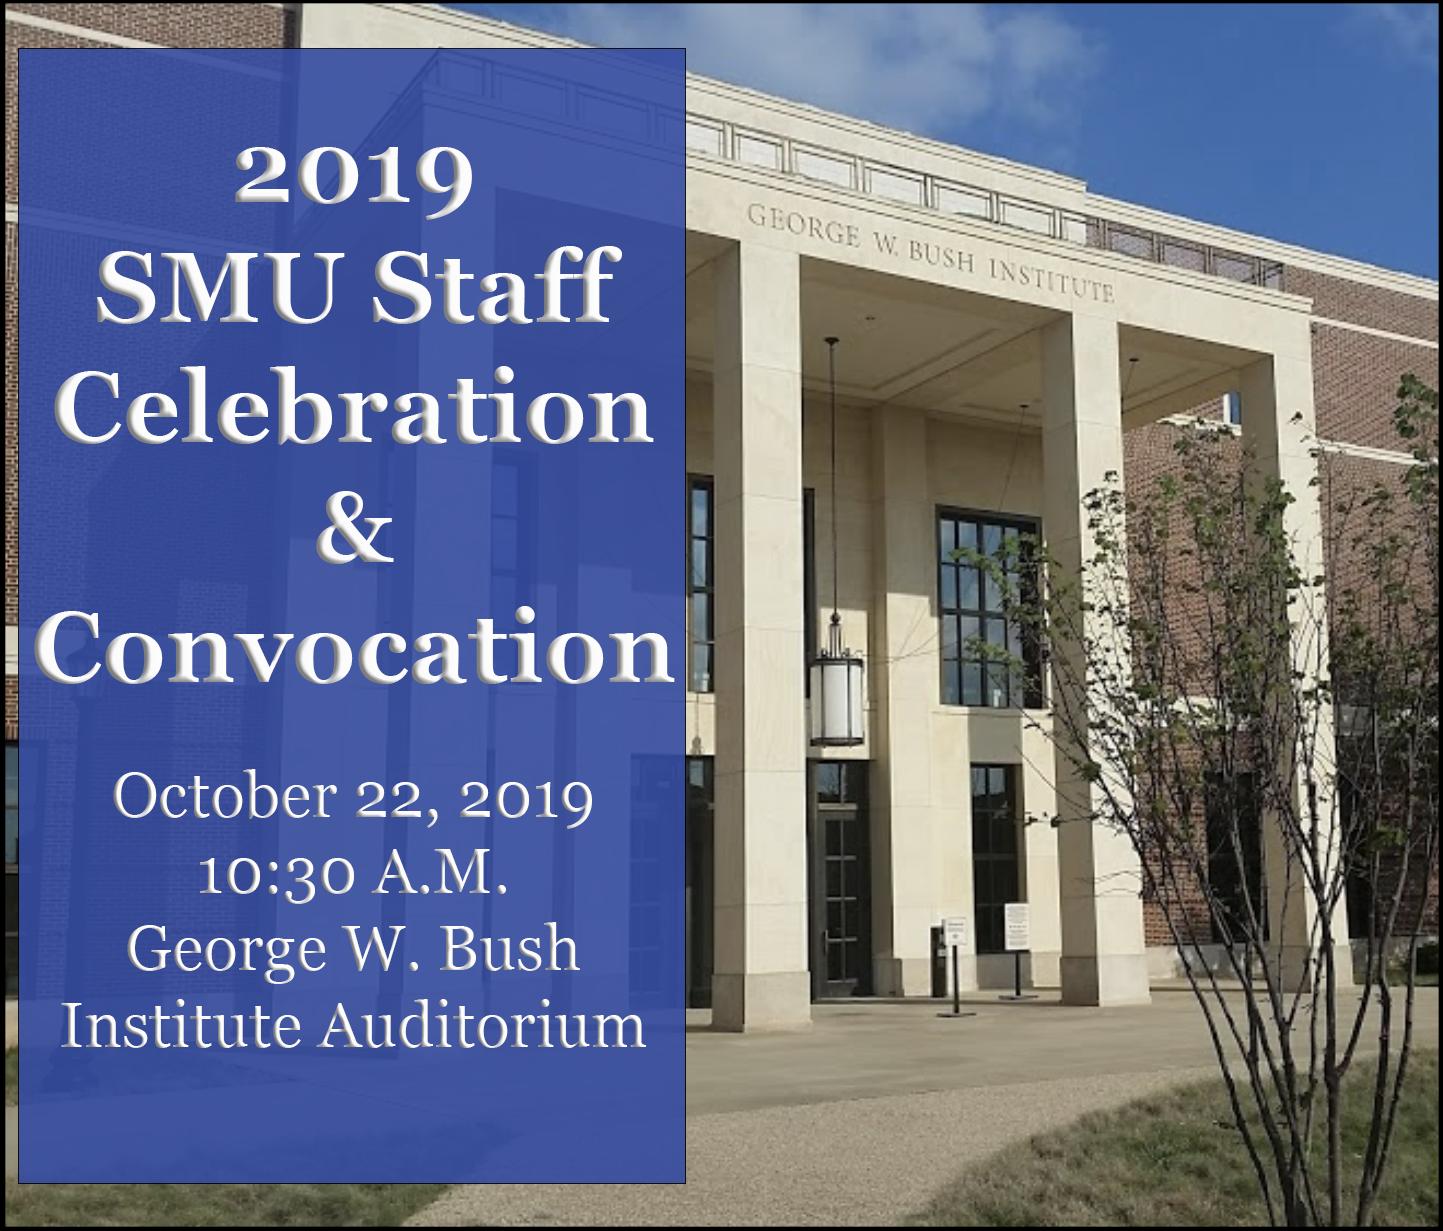 Staff Celebration & Convocation at the Bush Institute